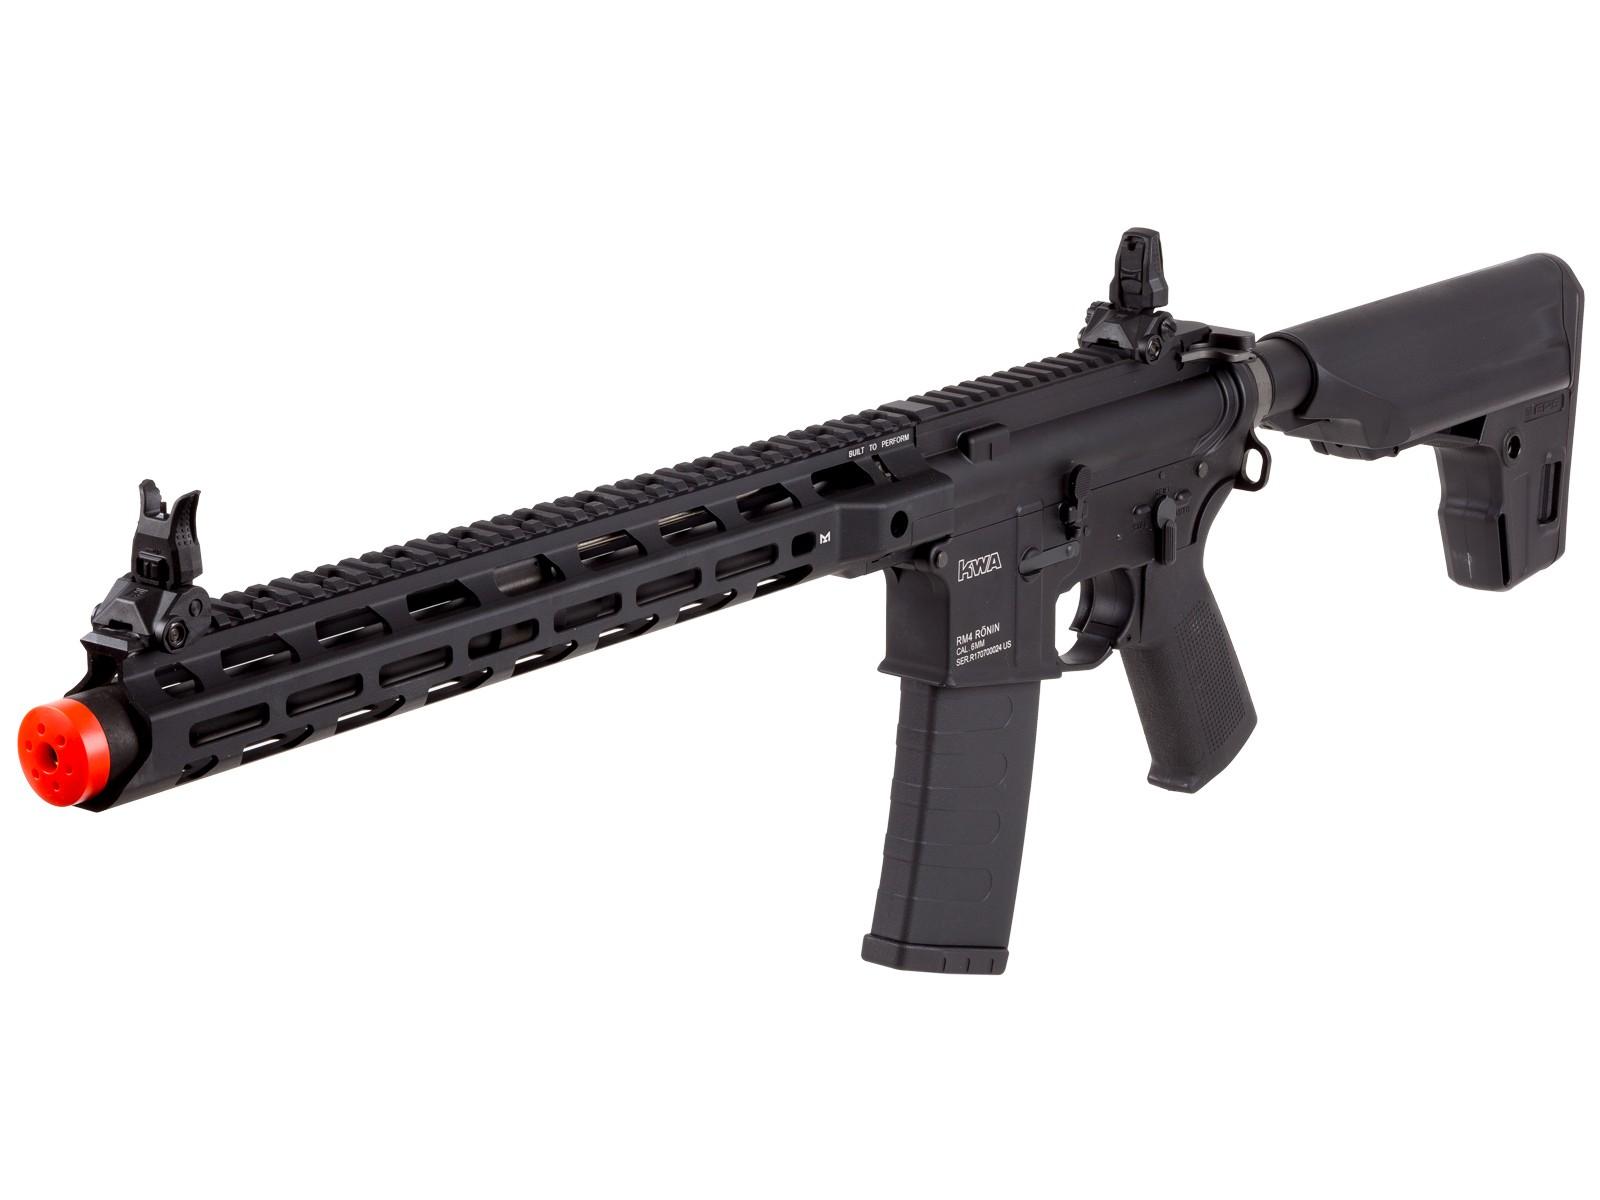 KWA AEG3 RM4 Ronin Recon ML Airsoft Carbine